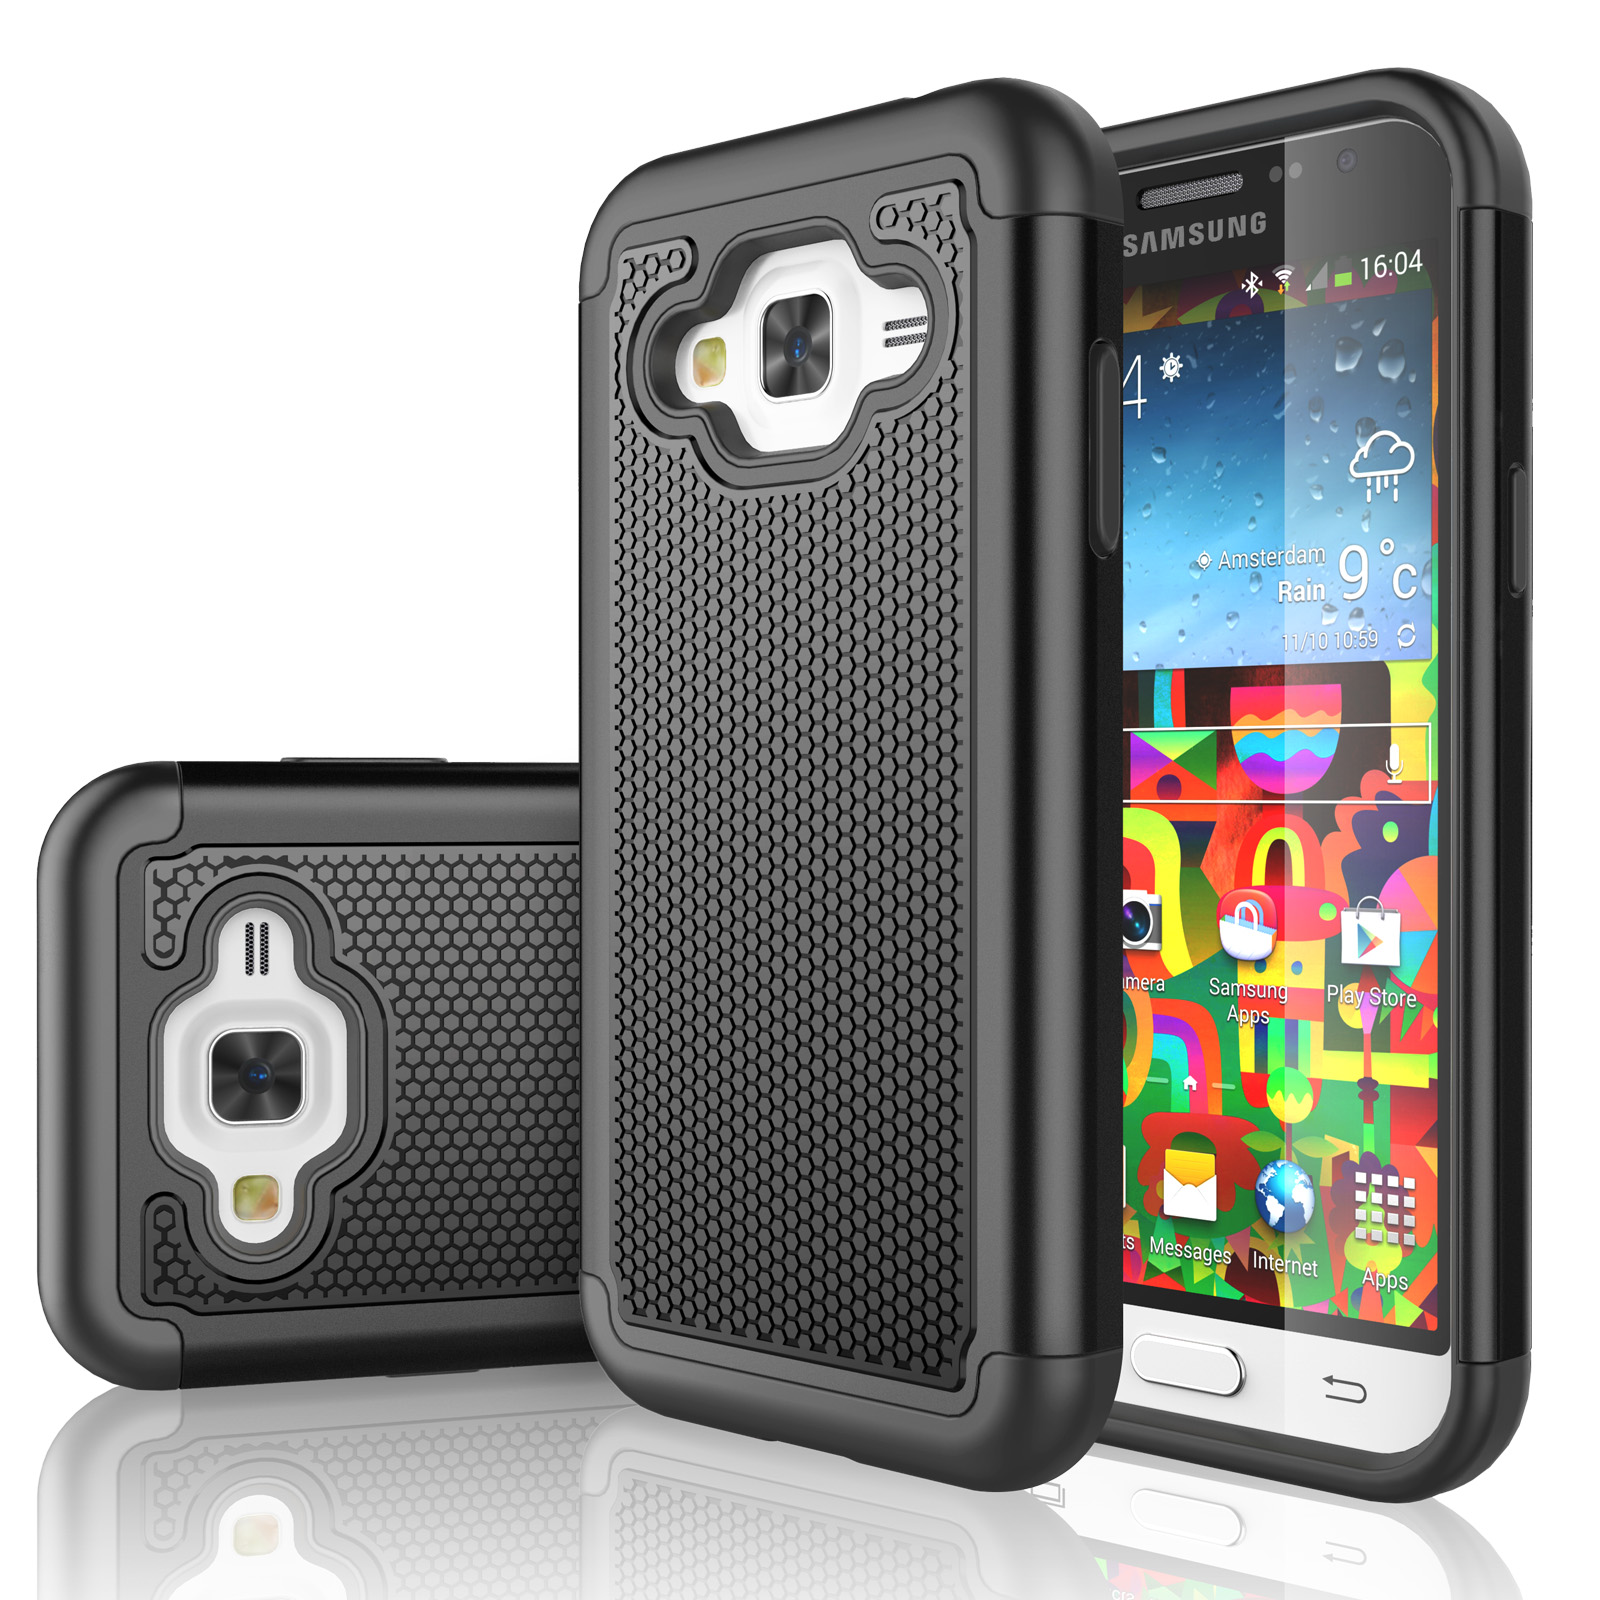 J7 Case. Galaxy J7 Case. Tekcoo [Tmajor Series] Shock Absorbing Hybrid Rubber Plastic Impact Defender Rugged Slim Hard Case Cover For Samsung ...